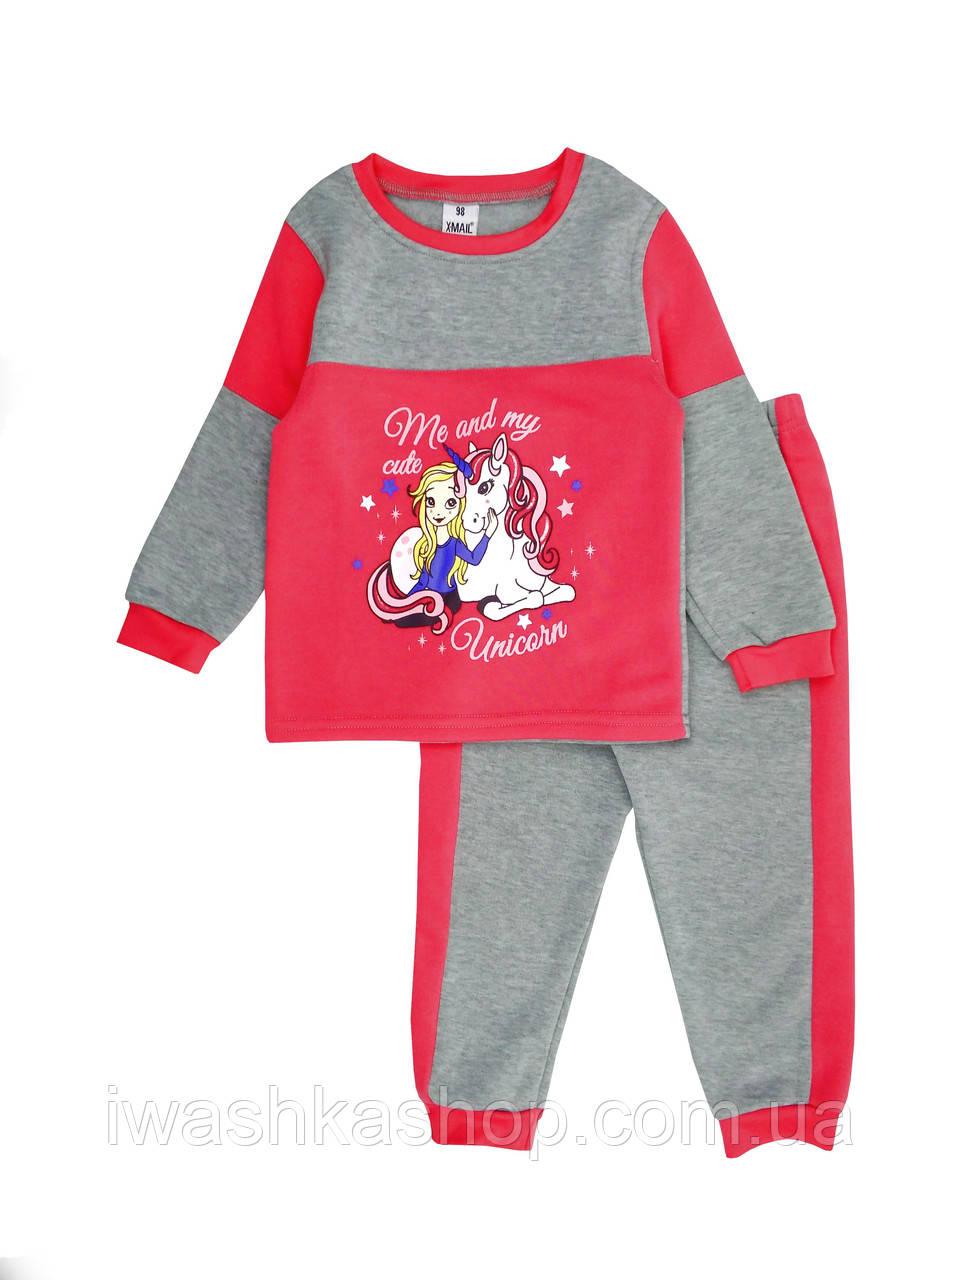 Теплый костюм с единорогом на девочек 3 - 4 лет, р. 104, X- Mail / KIK